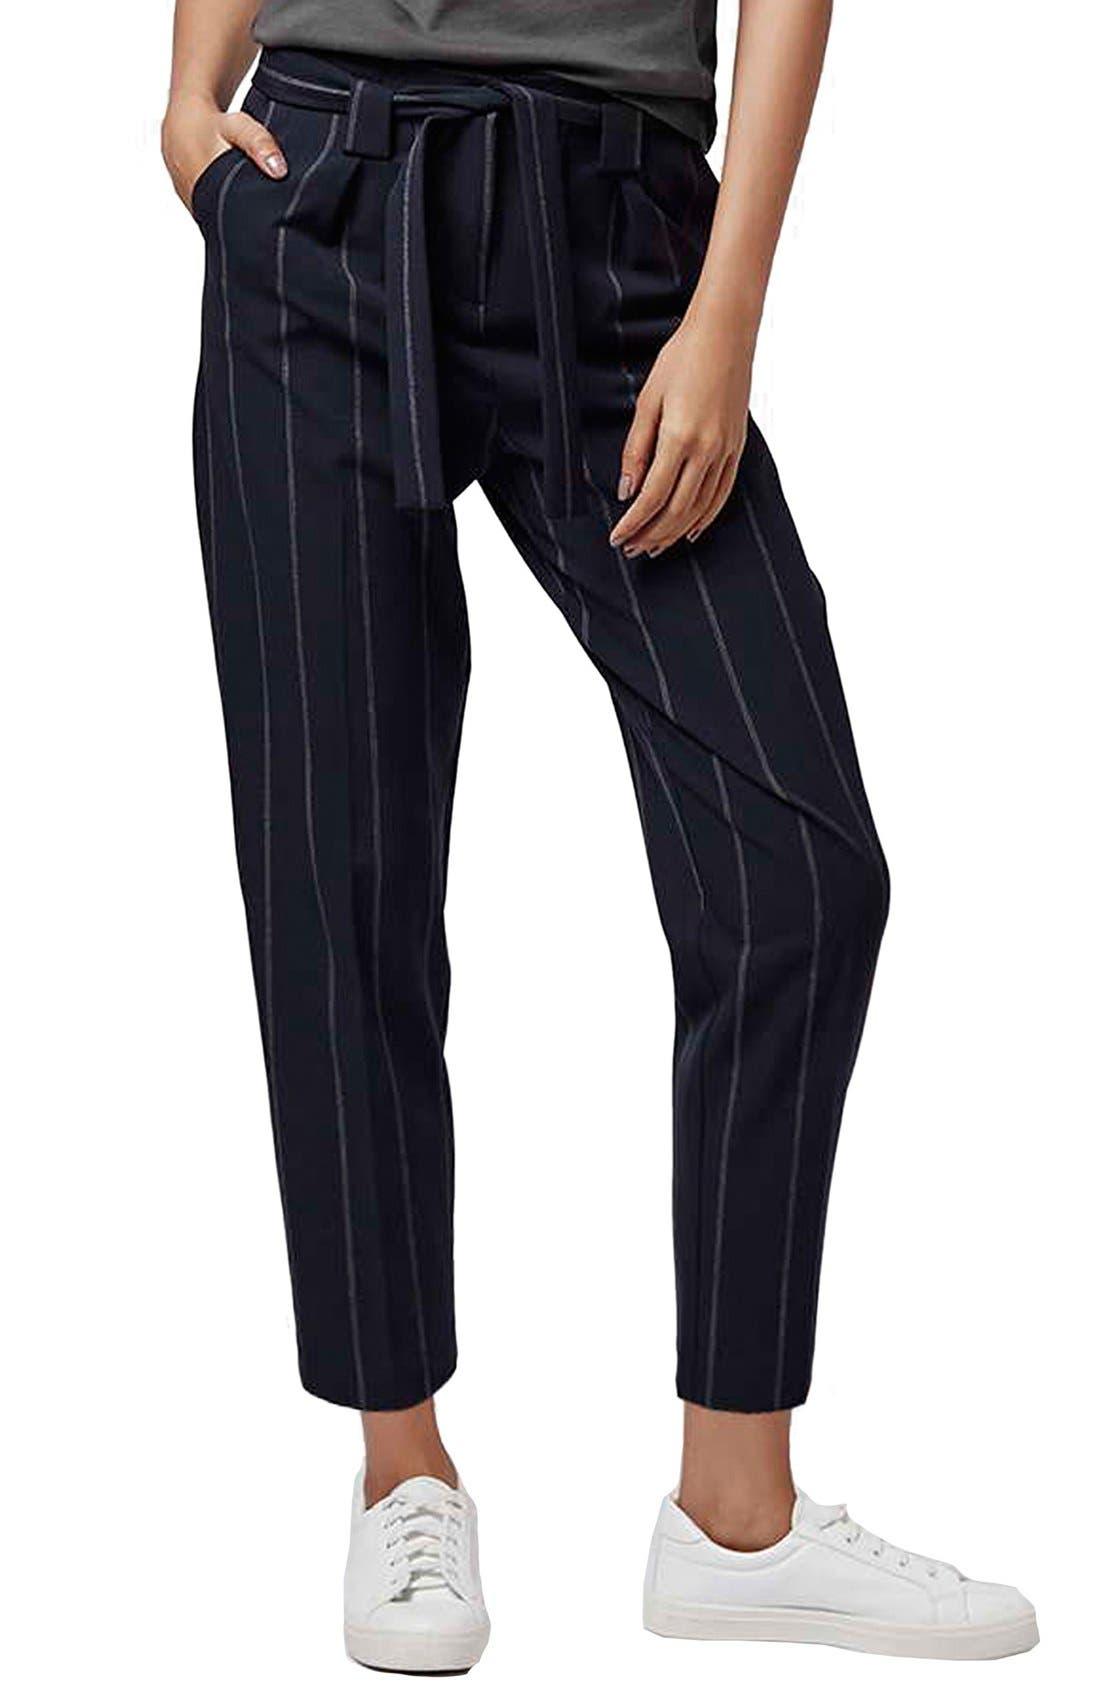 Alternate Image 1 Selected - Topshop Belted Pinstripe Pants (Regular & Petite)